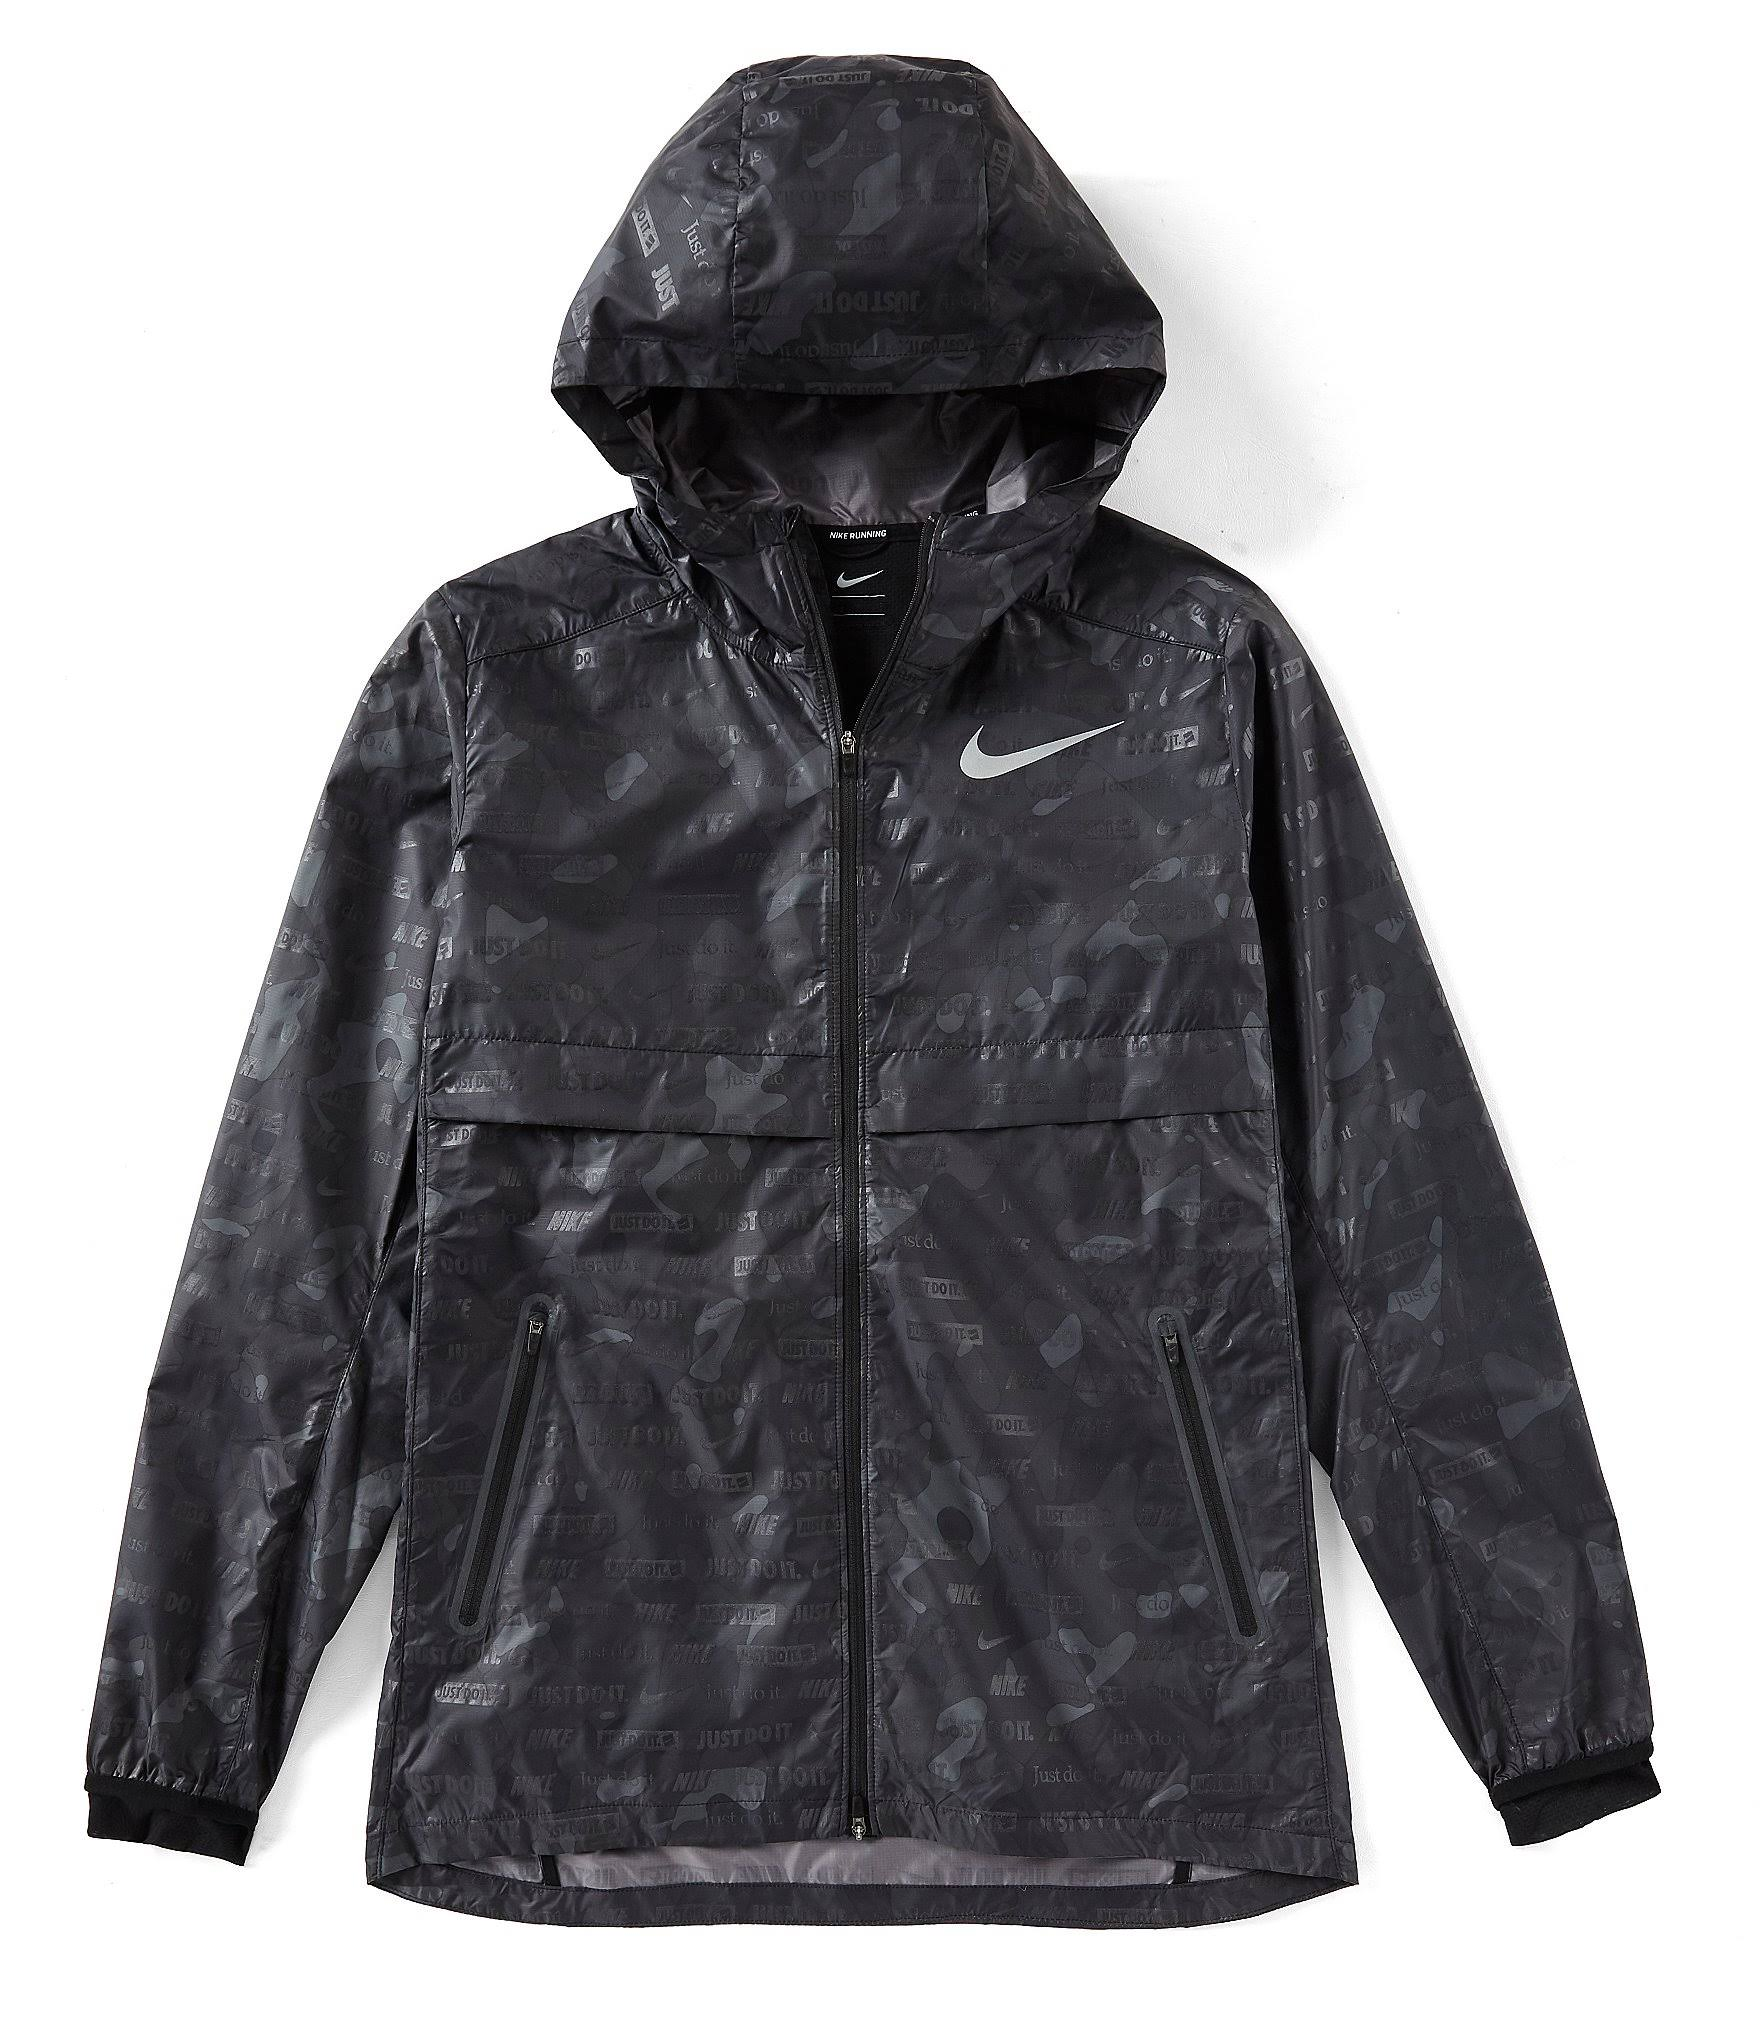 Negro Ghost Jacket Shield Reflectante Hombre Nike Camo Plata Xw6qwv